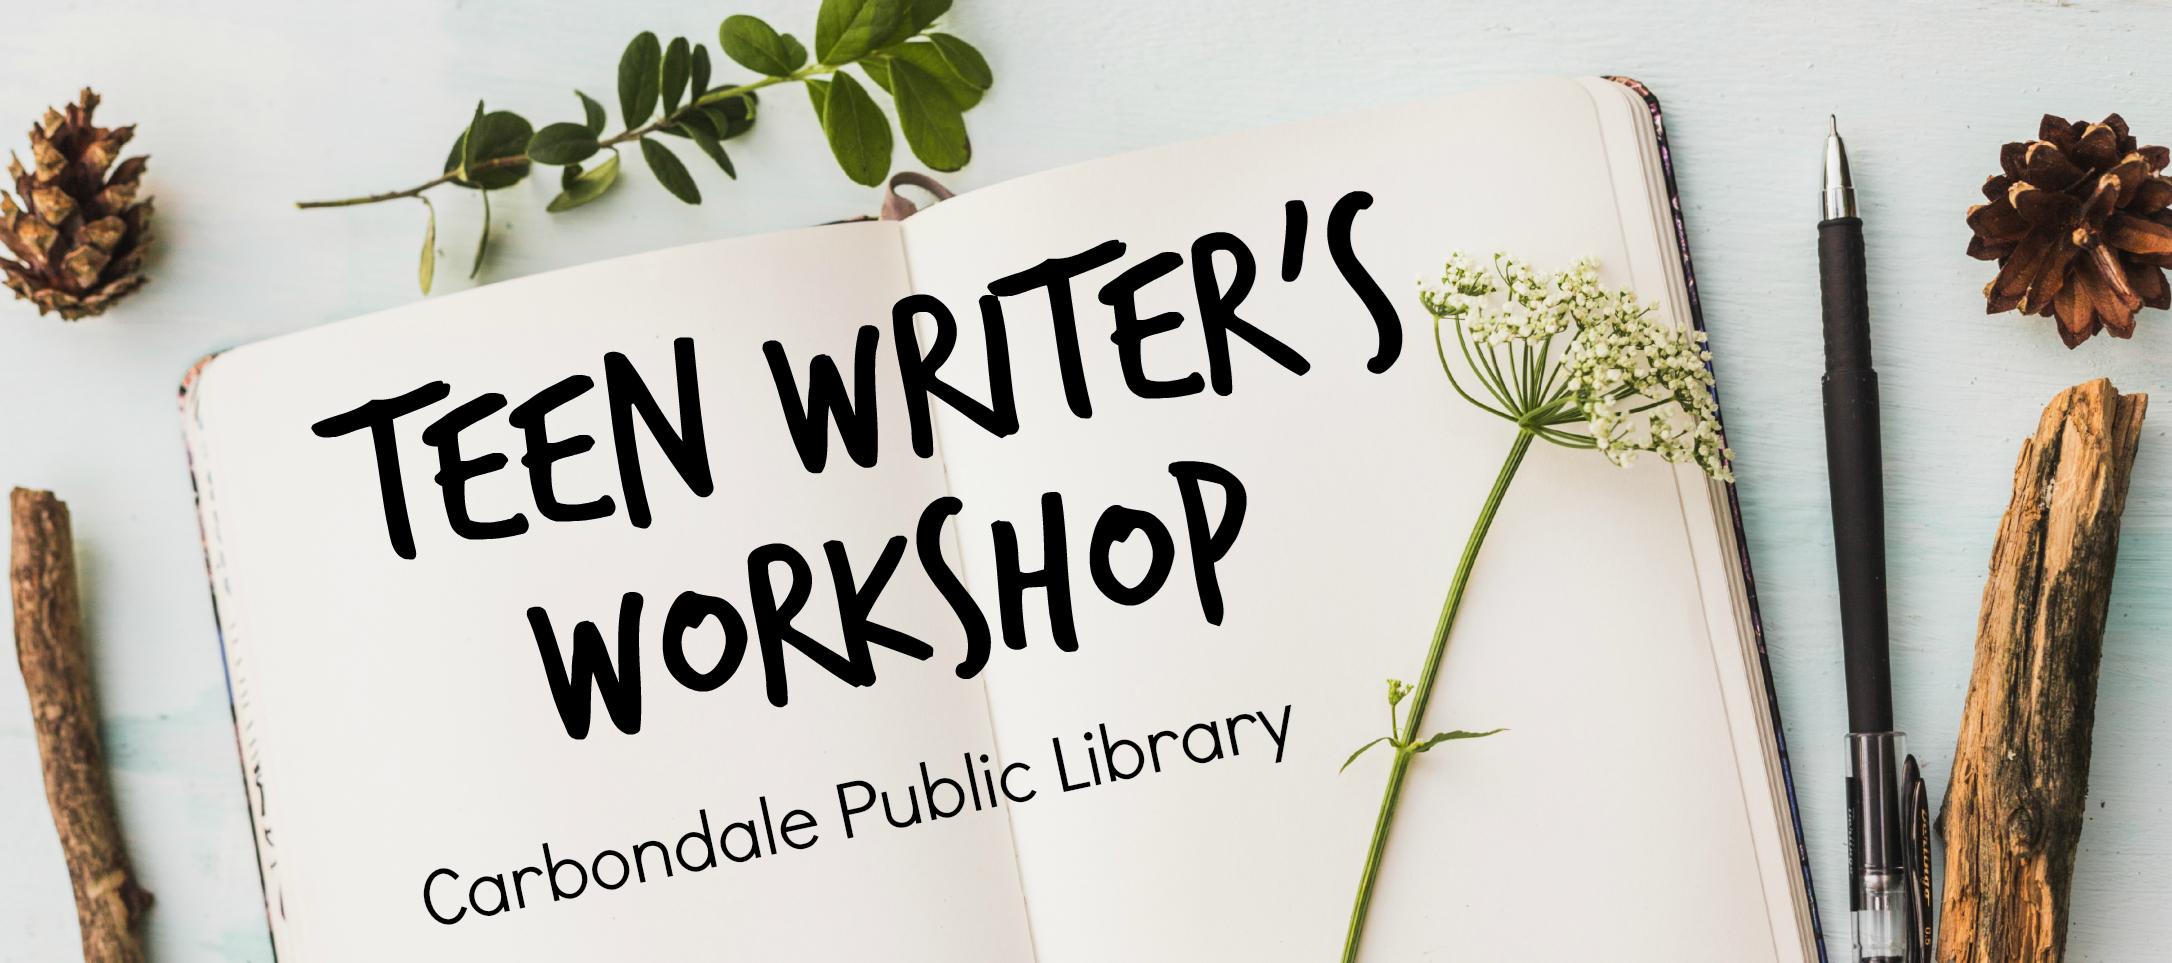 Teen Writer's Workshop